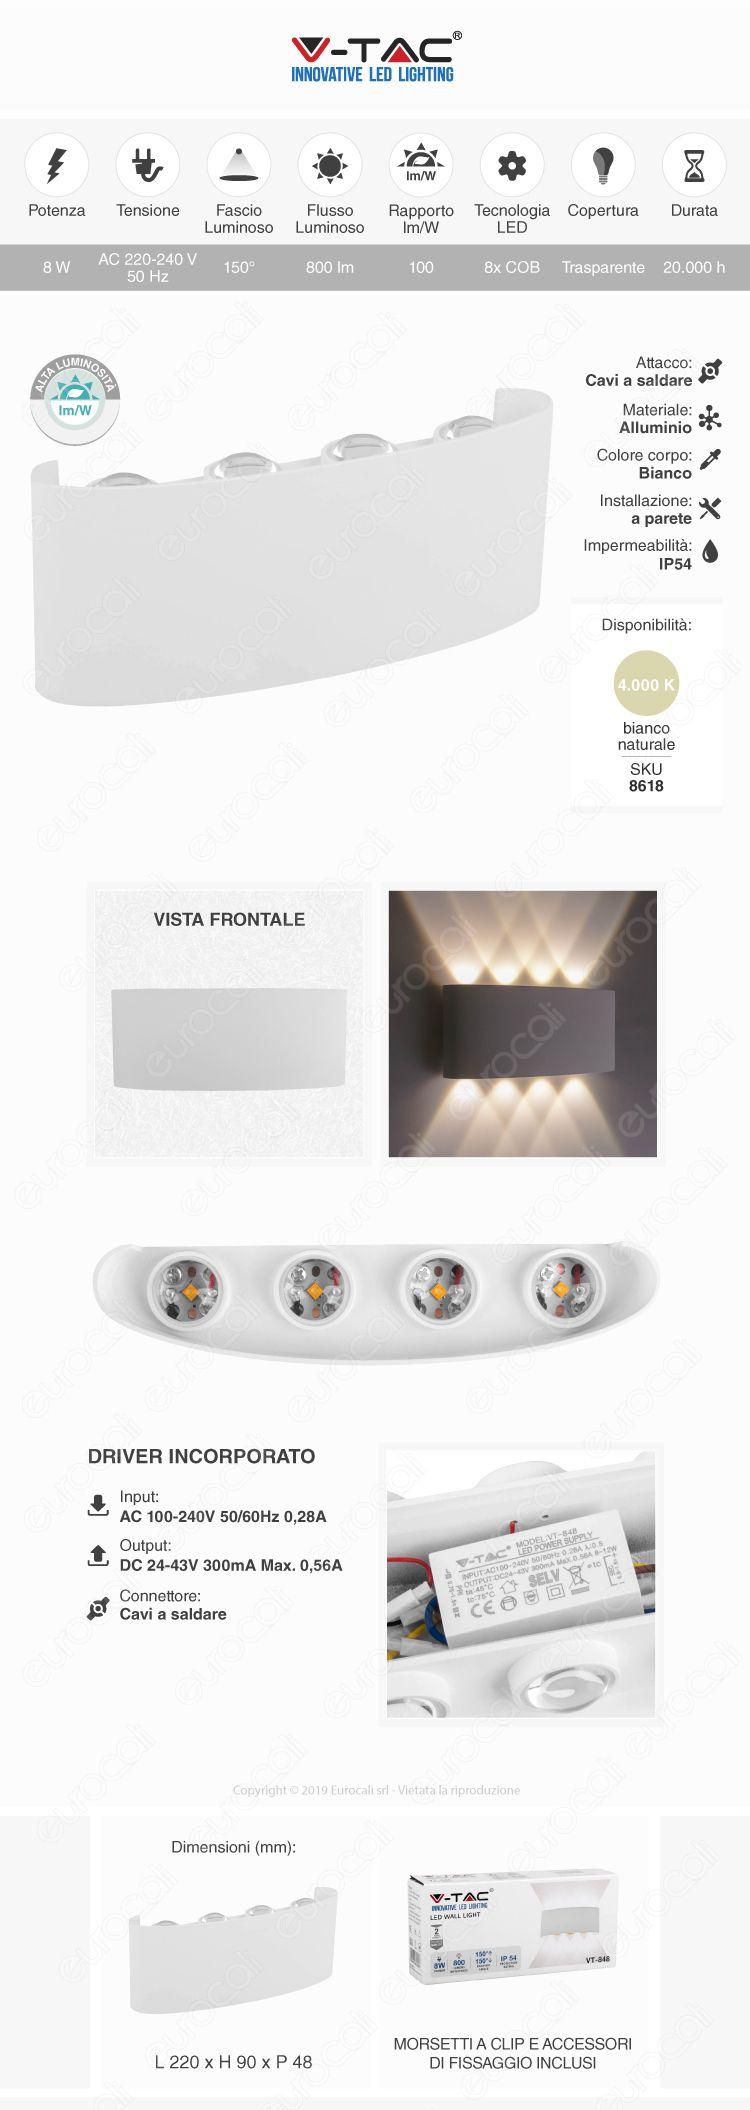 V-Tac VT-848 LED Wall Light 8W